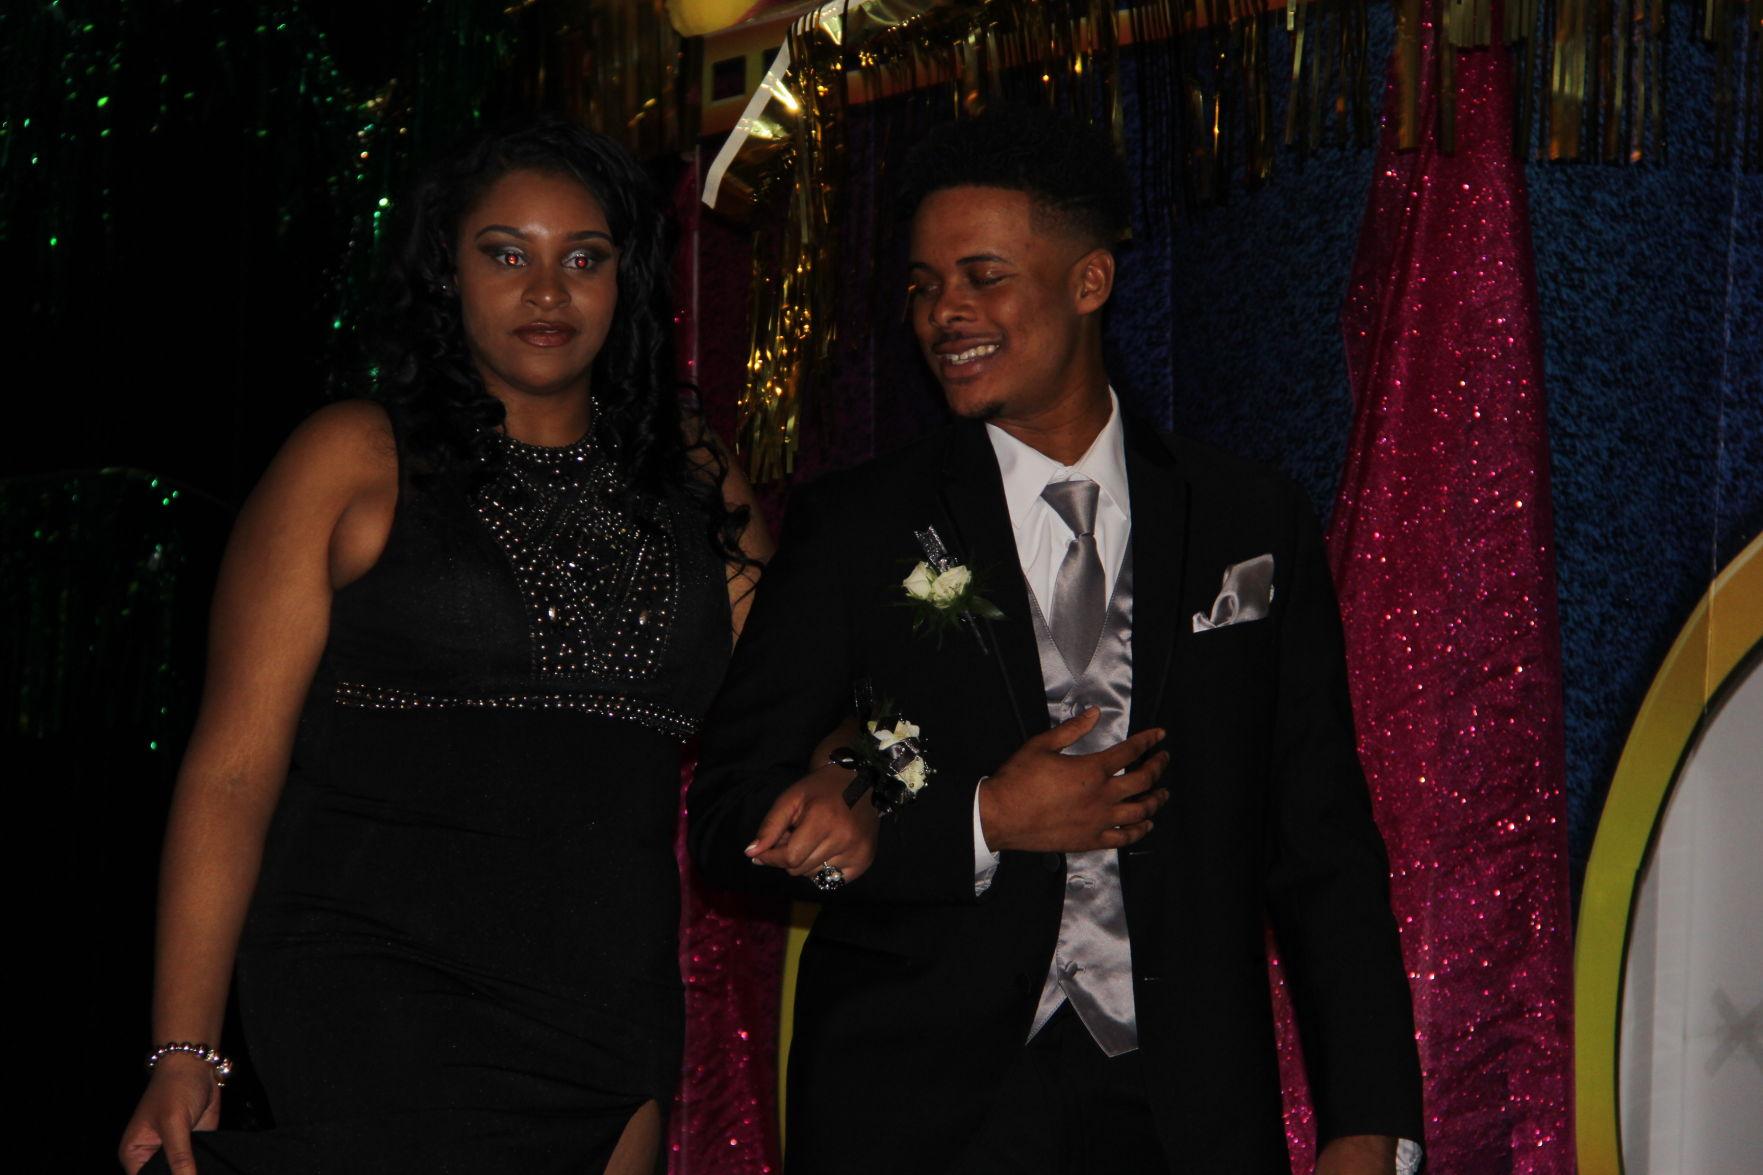 GALLERY: Mansfield High School Prom 2018